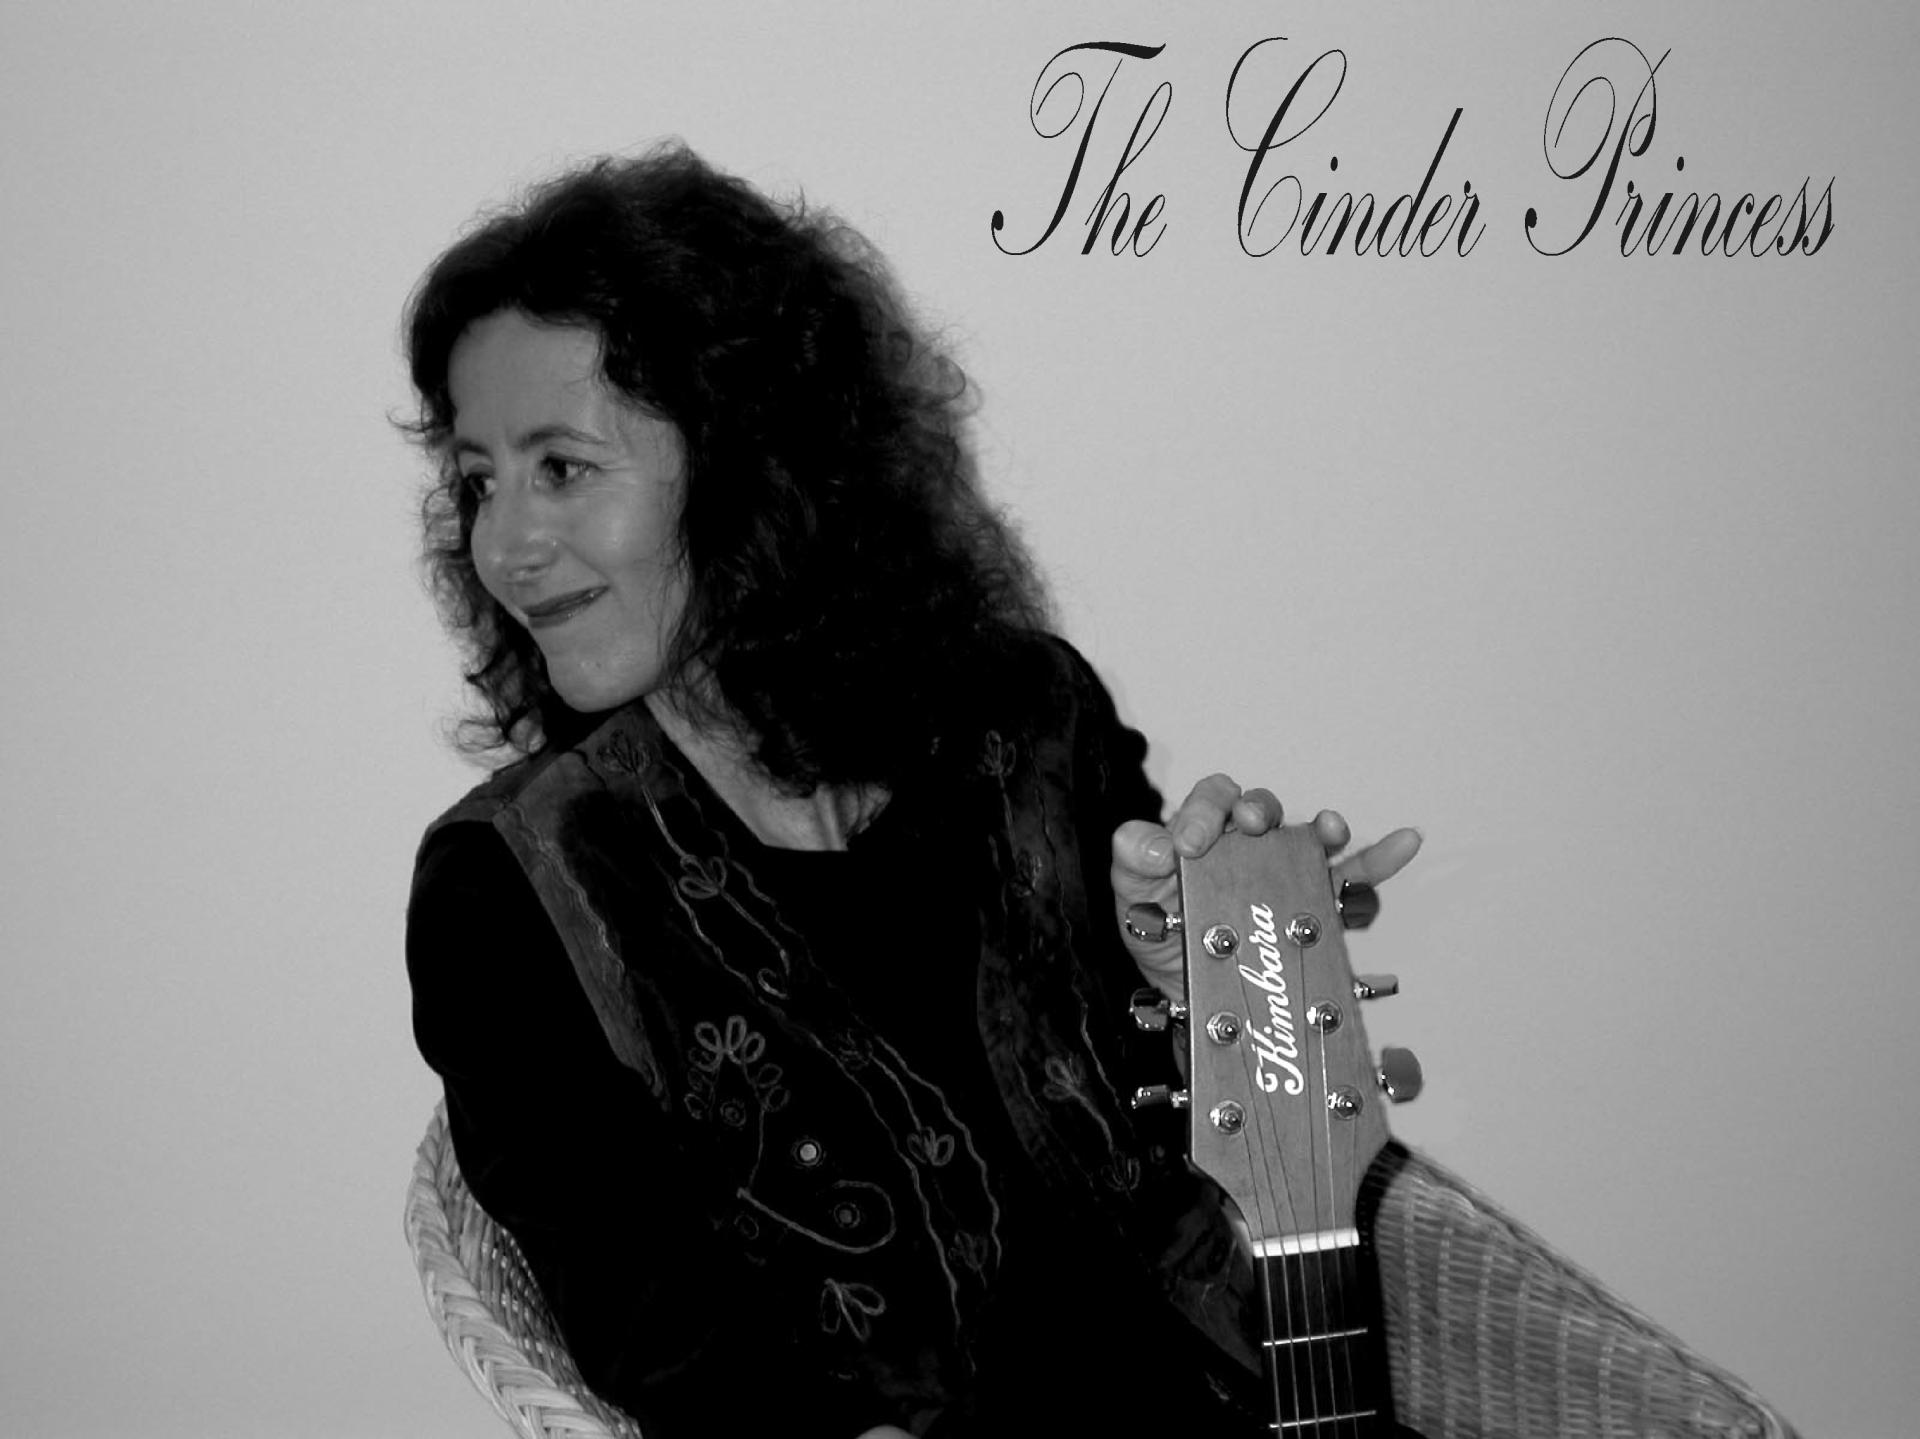 Cinder Princess UK Female Folk Garden Records